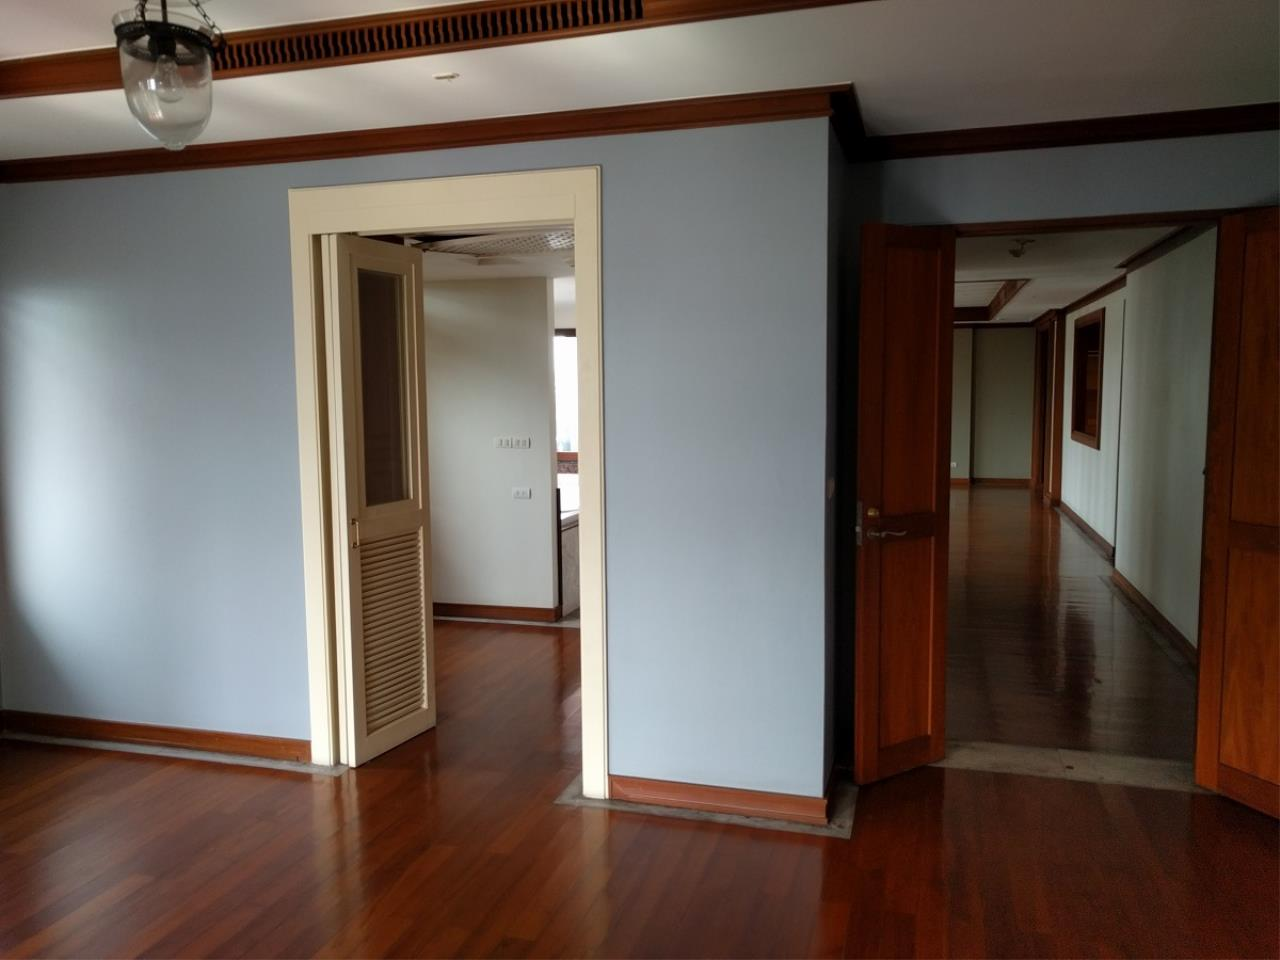 RE/MAX CondoDee Agency's Thai Elegance Luxury Condominium - Entire Building for Sale 4